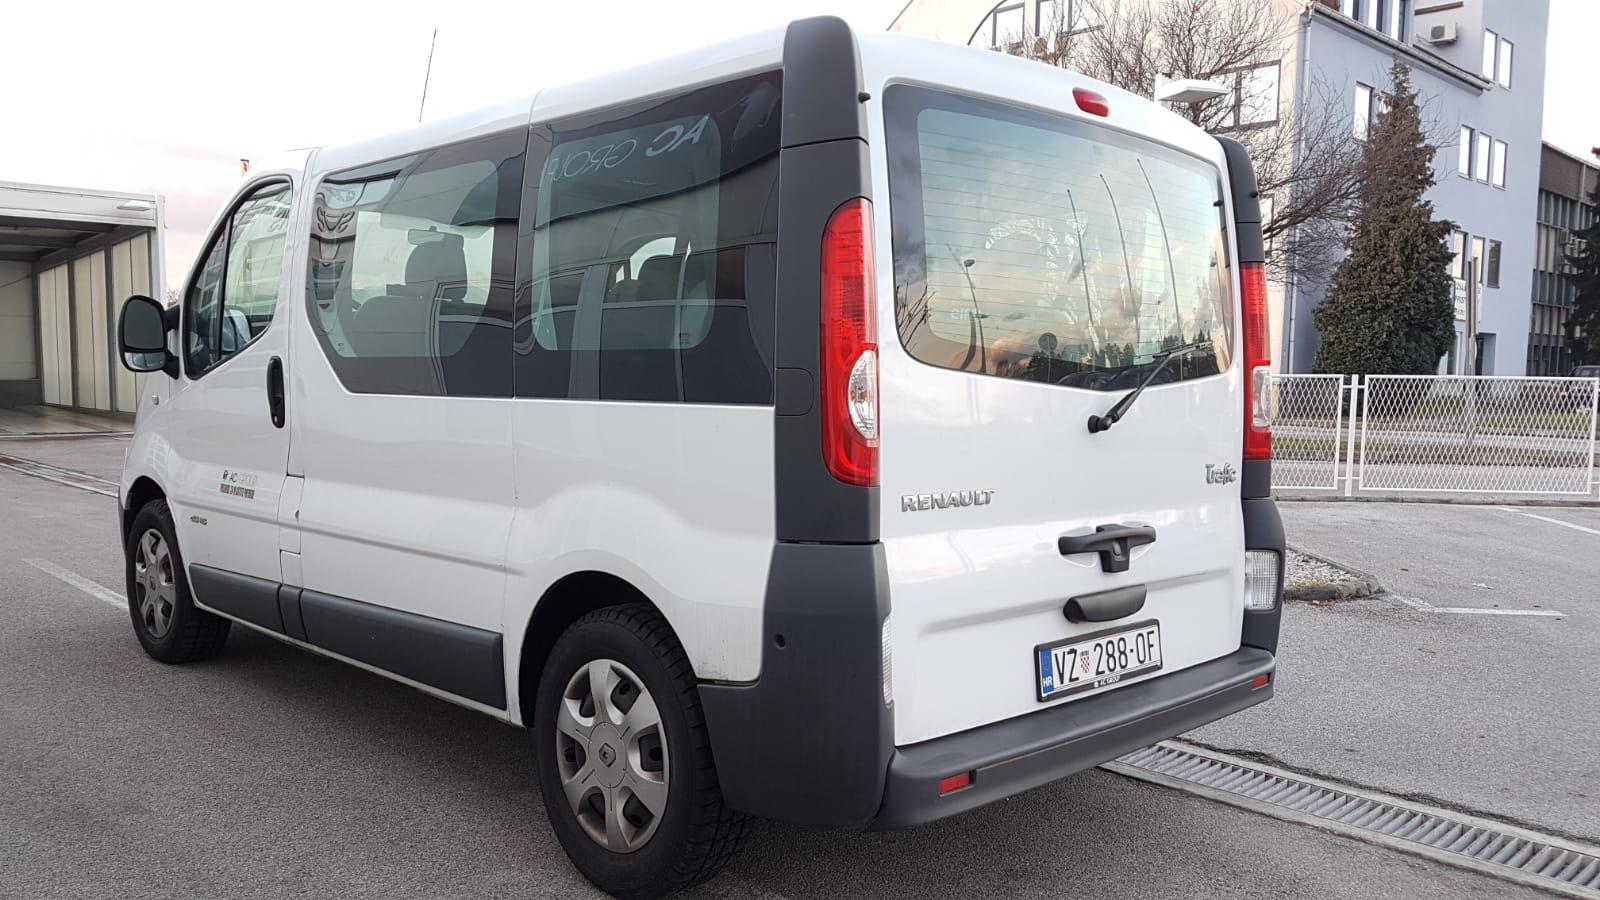 Renault Trafic 1 (VŽ 288-OF) 8